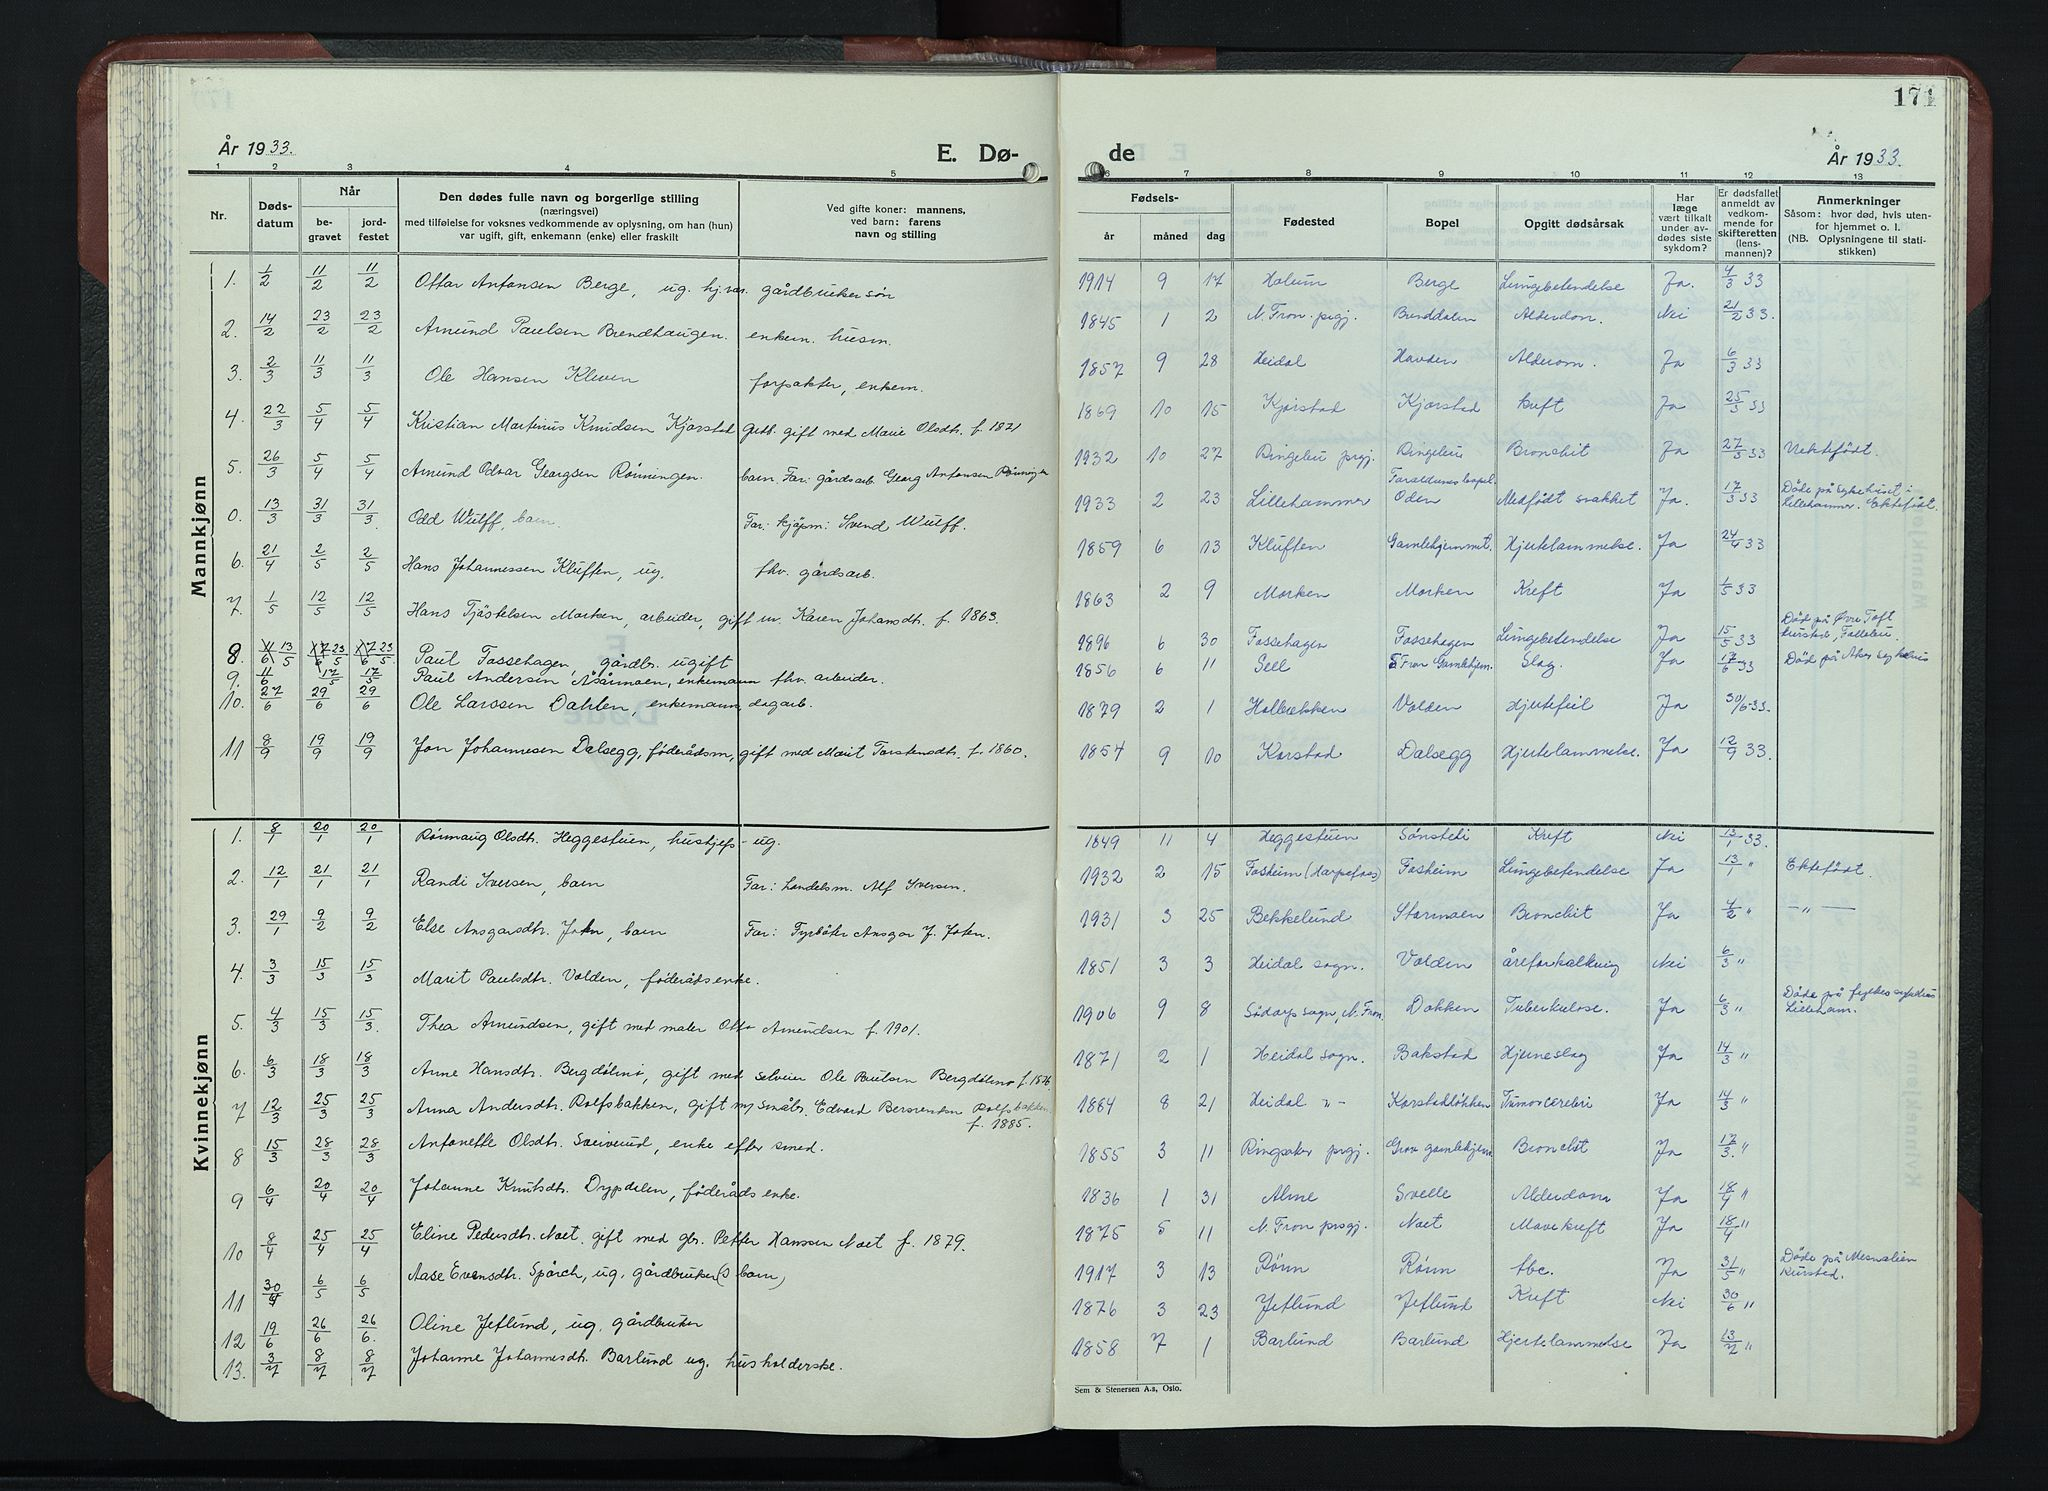 SAH, Sør-Fron prestekontor, H/Ha/Hab/L0006: Klokkerbok nr. 6, 1933-1948, s. 171